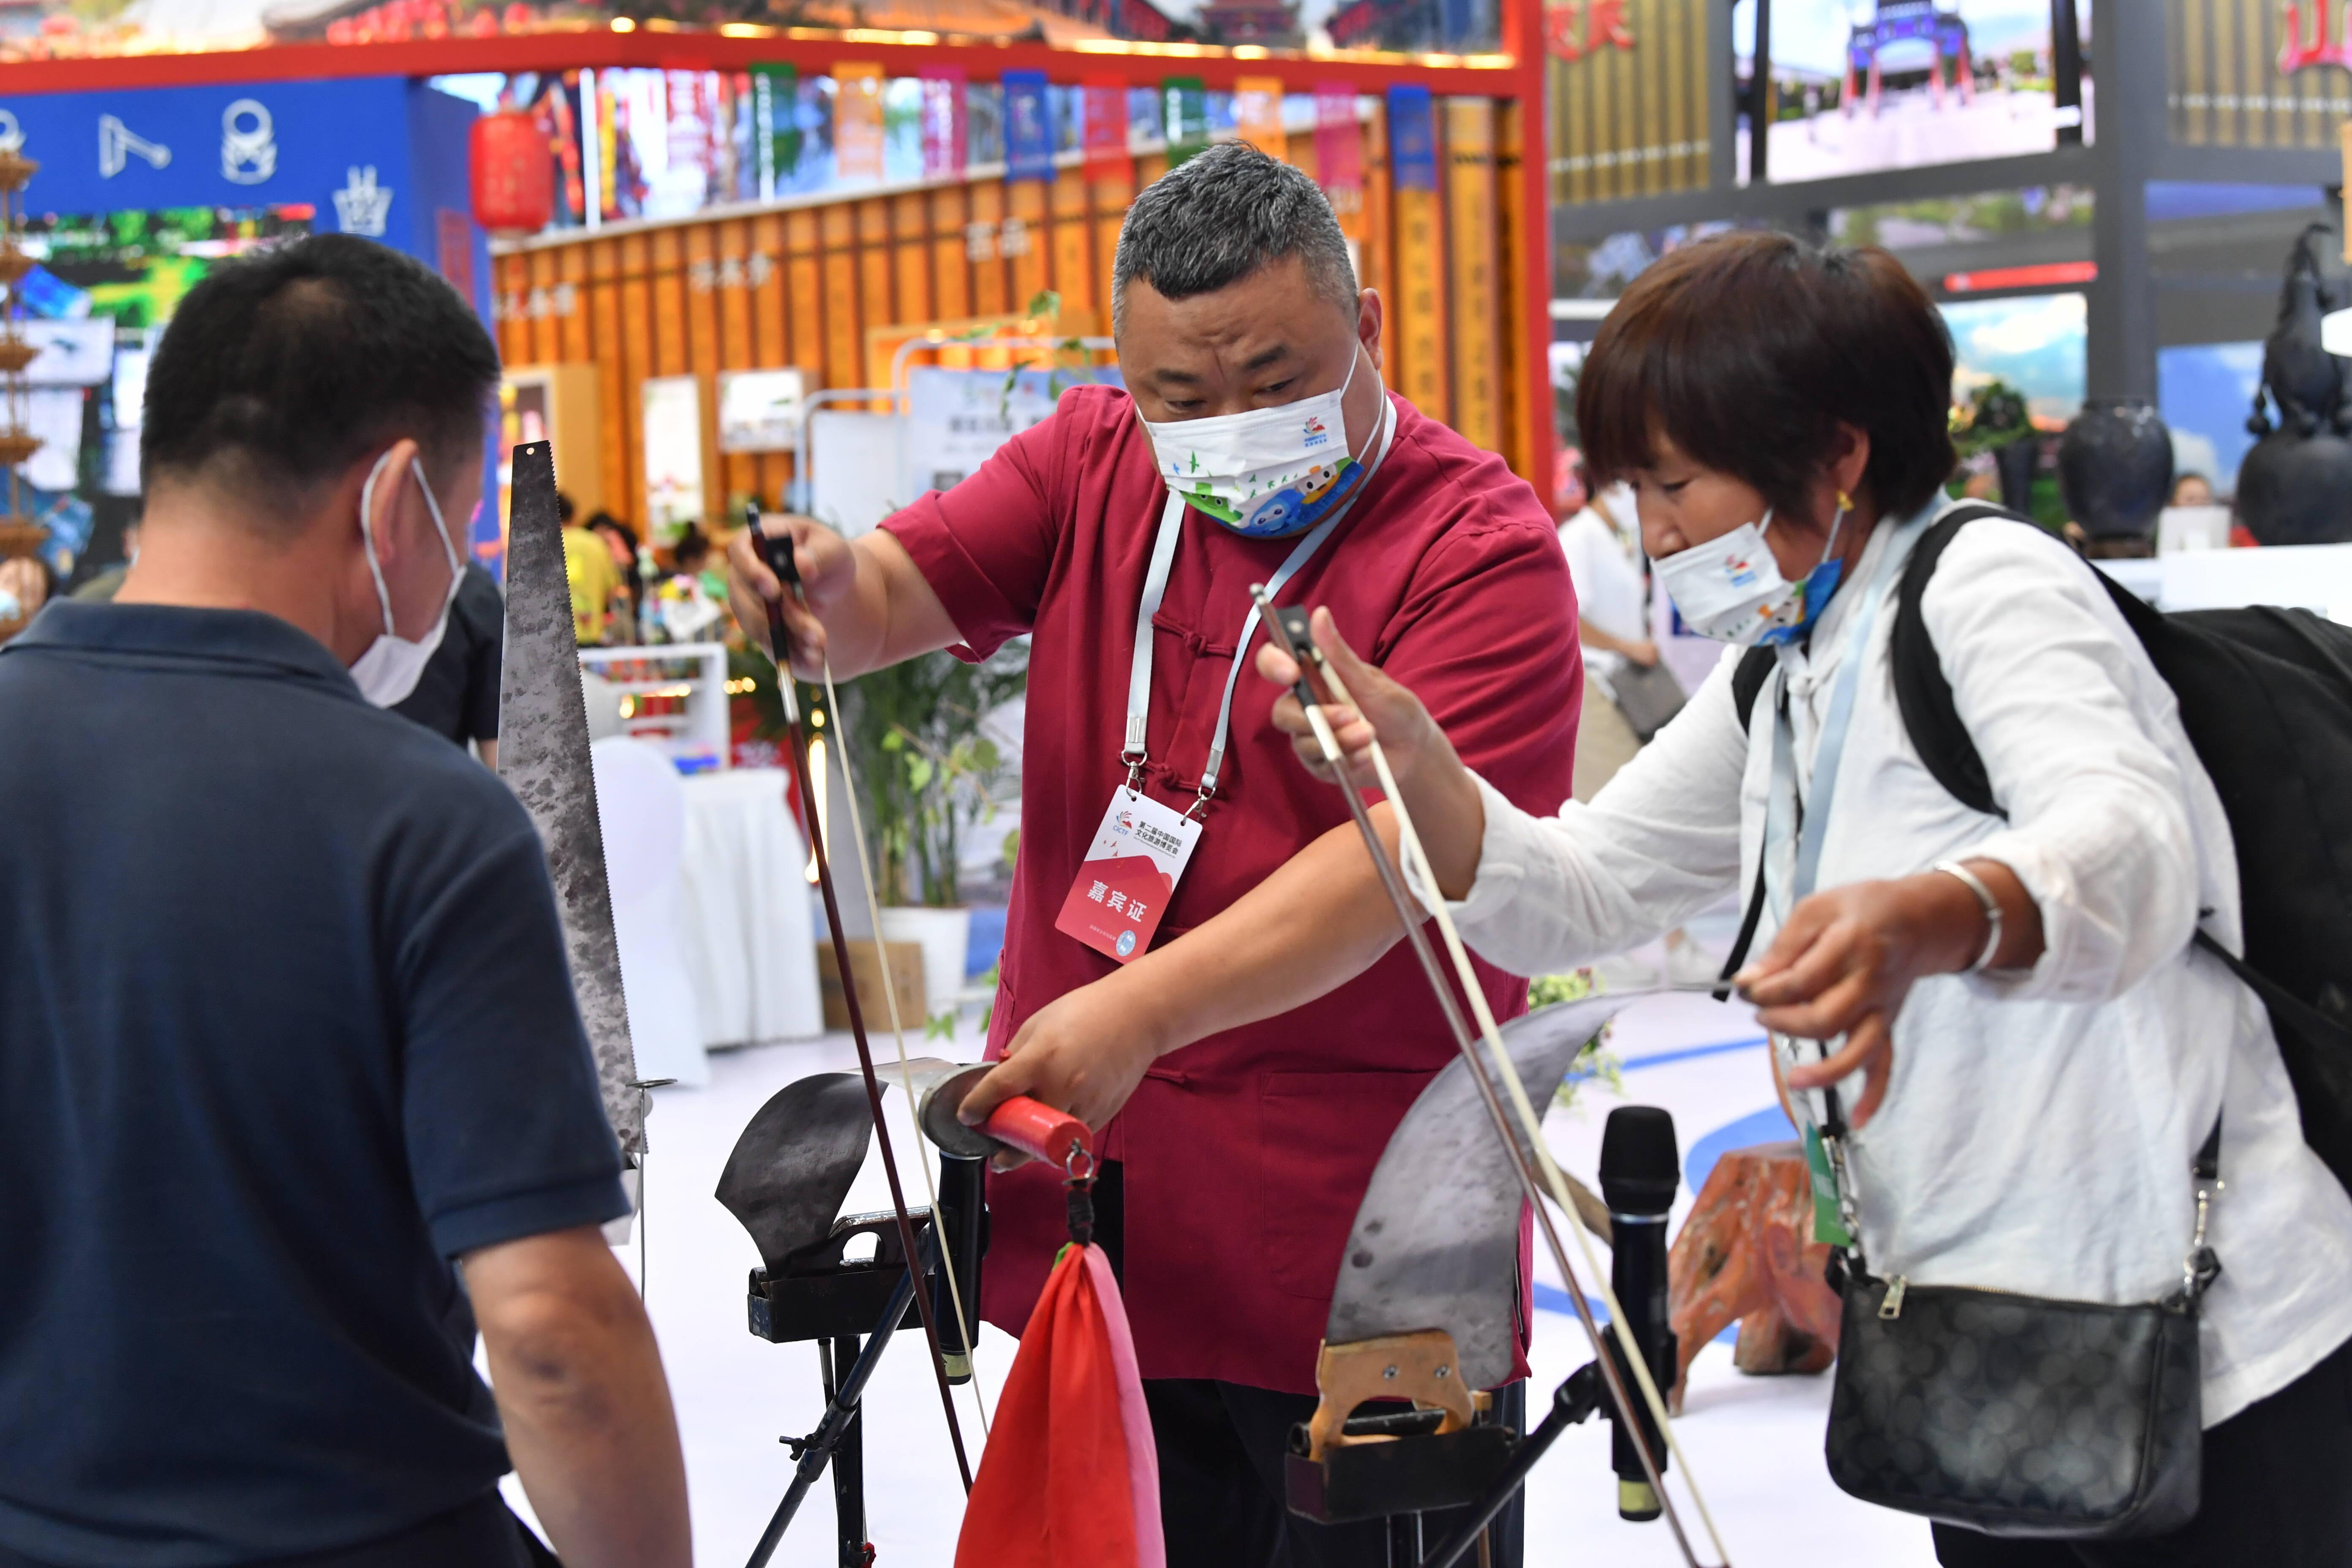 VLOG|大刀钢锯也能演奏歌曲 记者逛文旅博览会寻非遗传承人